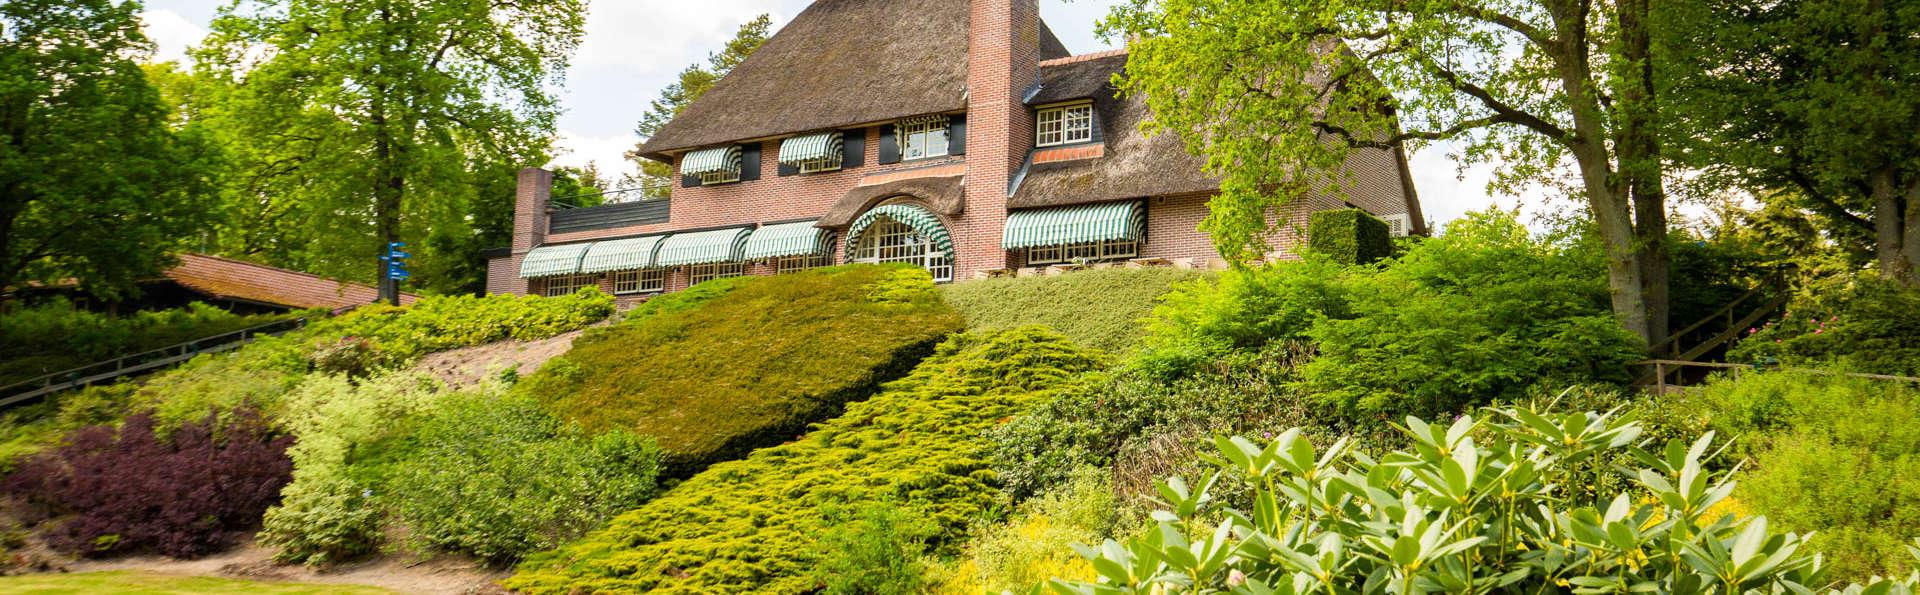 Fletcher Hotel Restaurant De Wipselberg-Veluwe - EDIT_NEW_EXTERIOR4.jpg